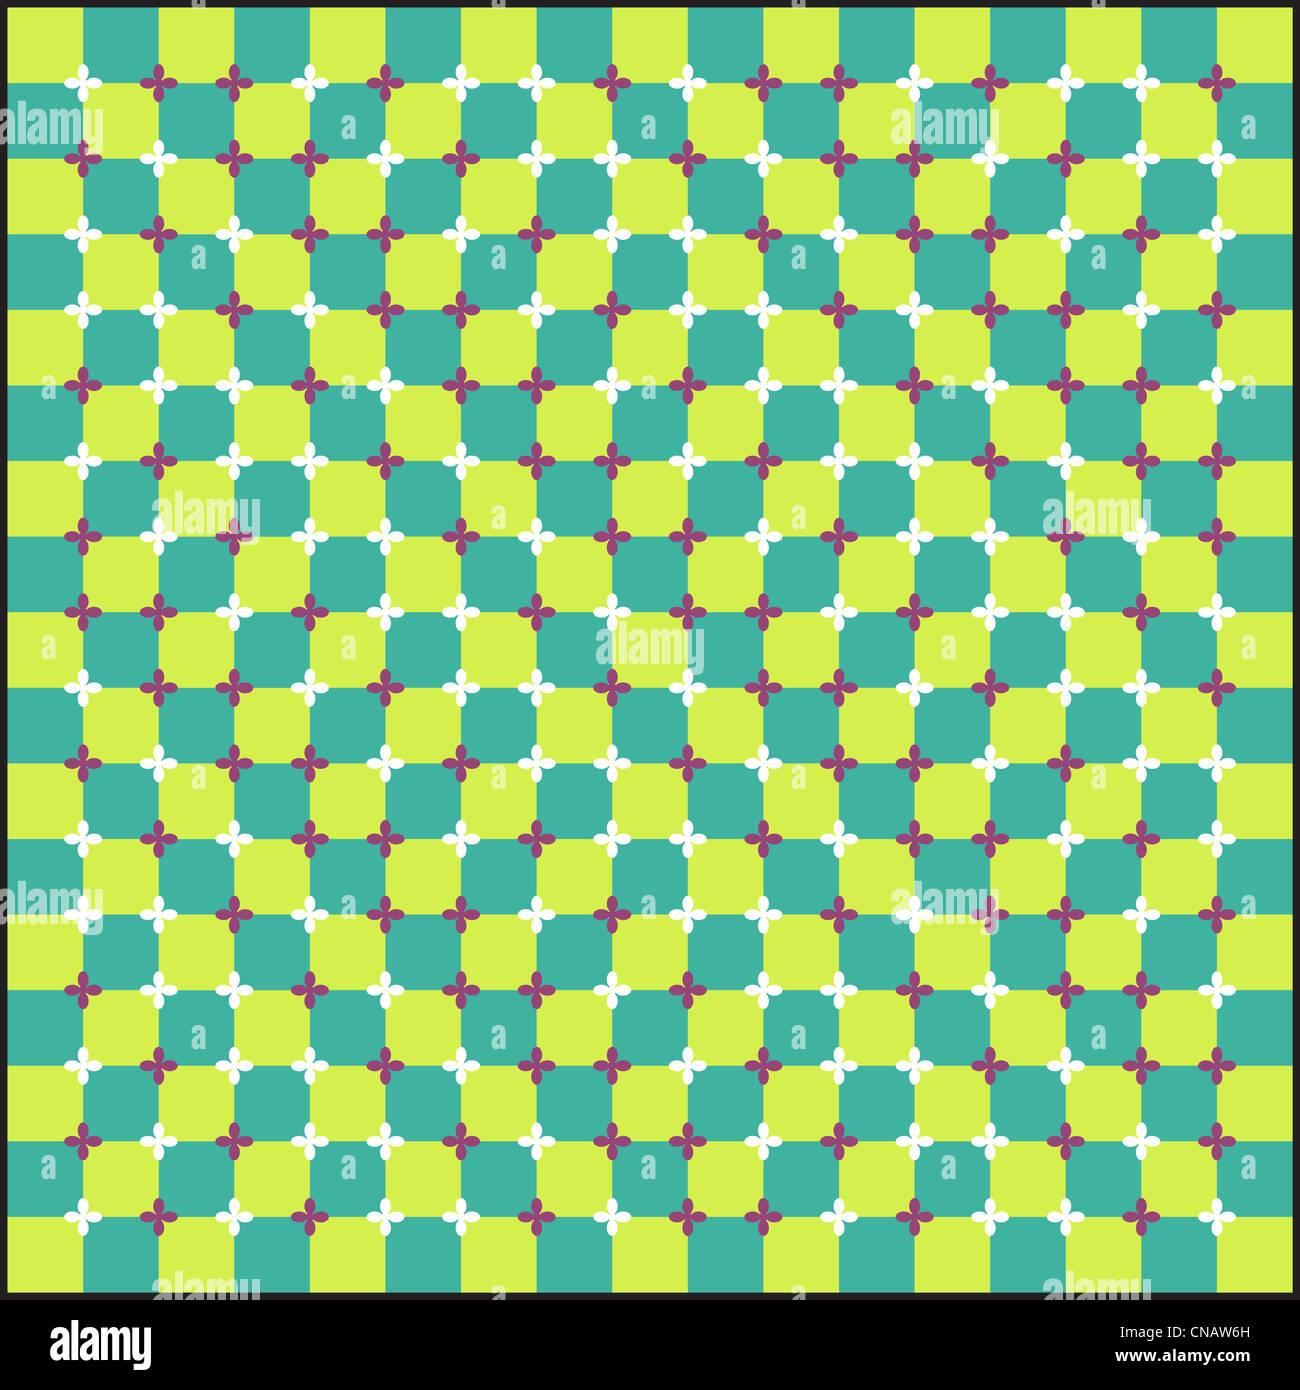 Optische Täuschung, bunte Blöcke, verschiedene Formen Stockbild